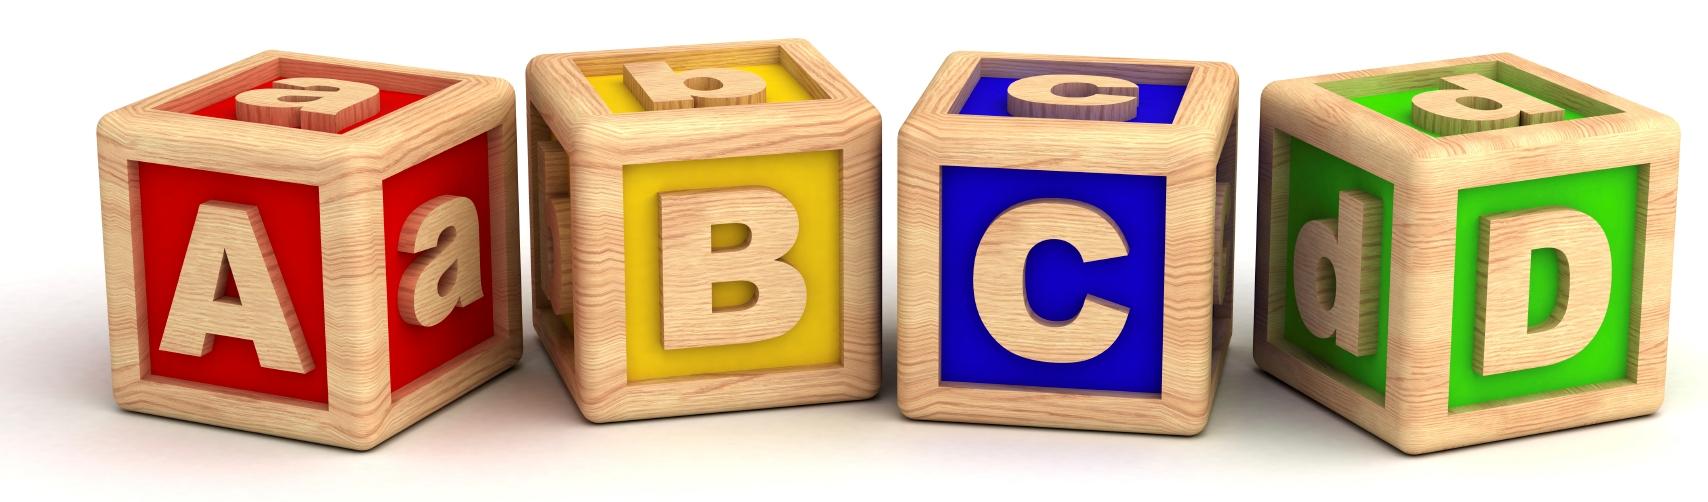 Who Building Blocks